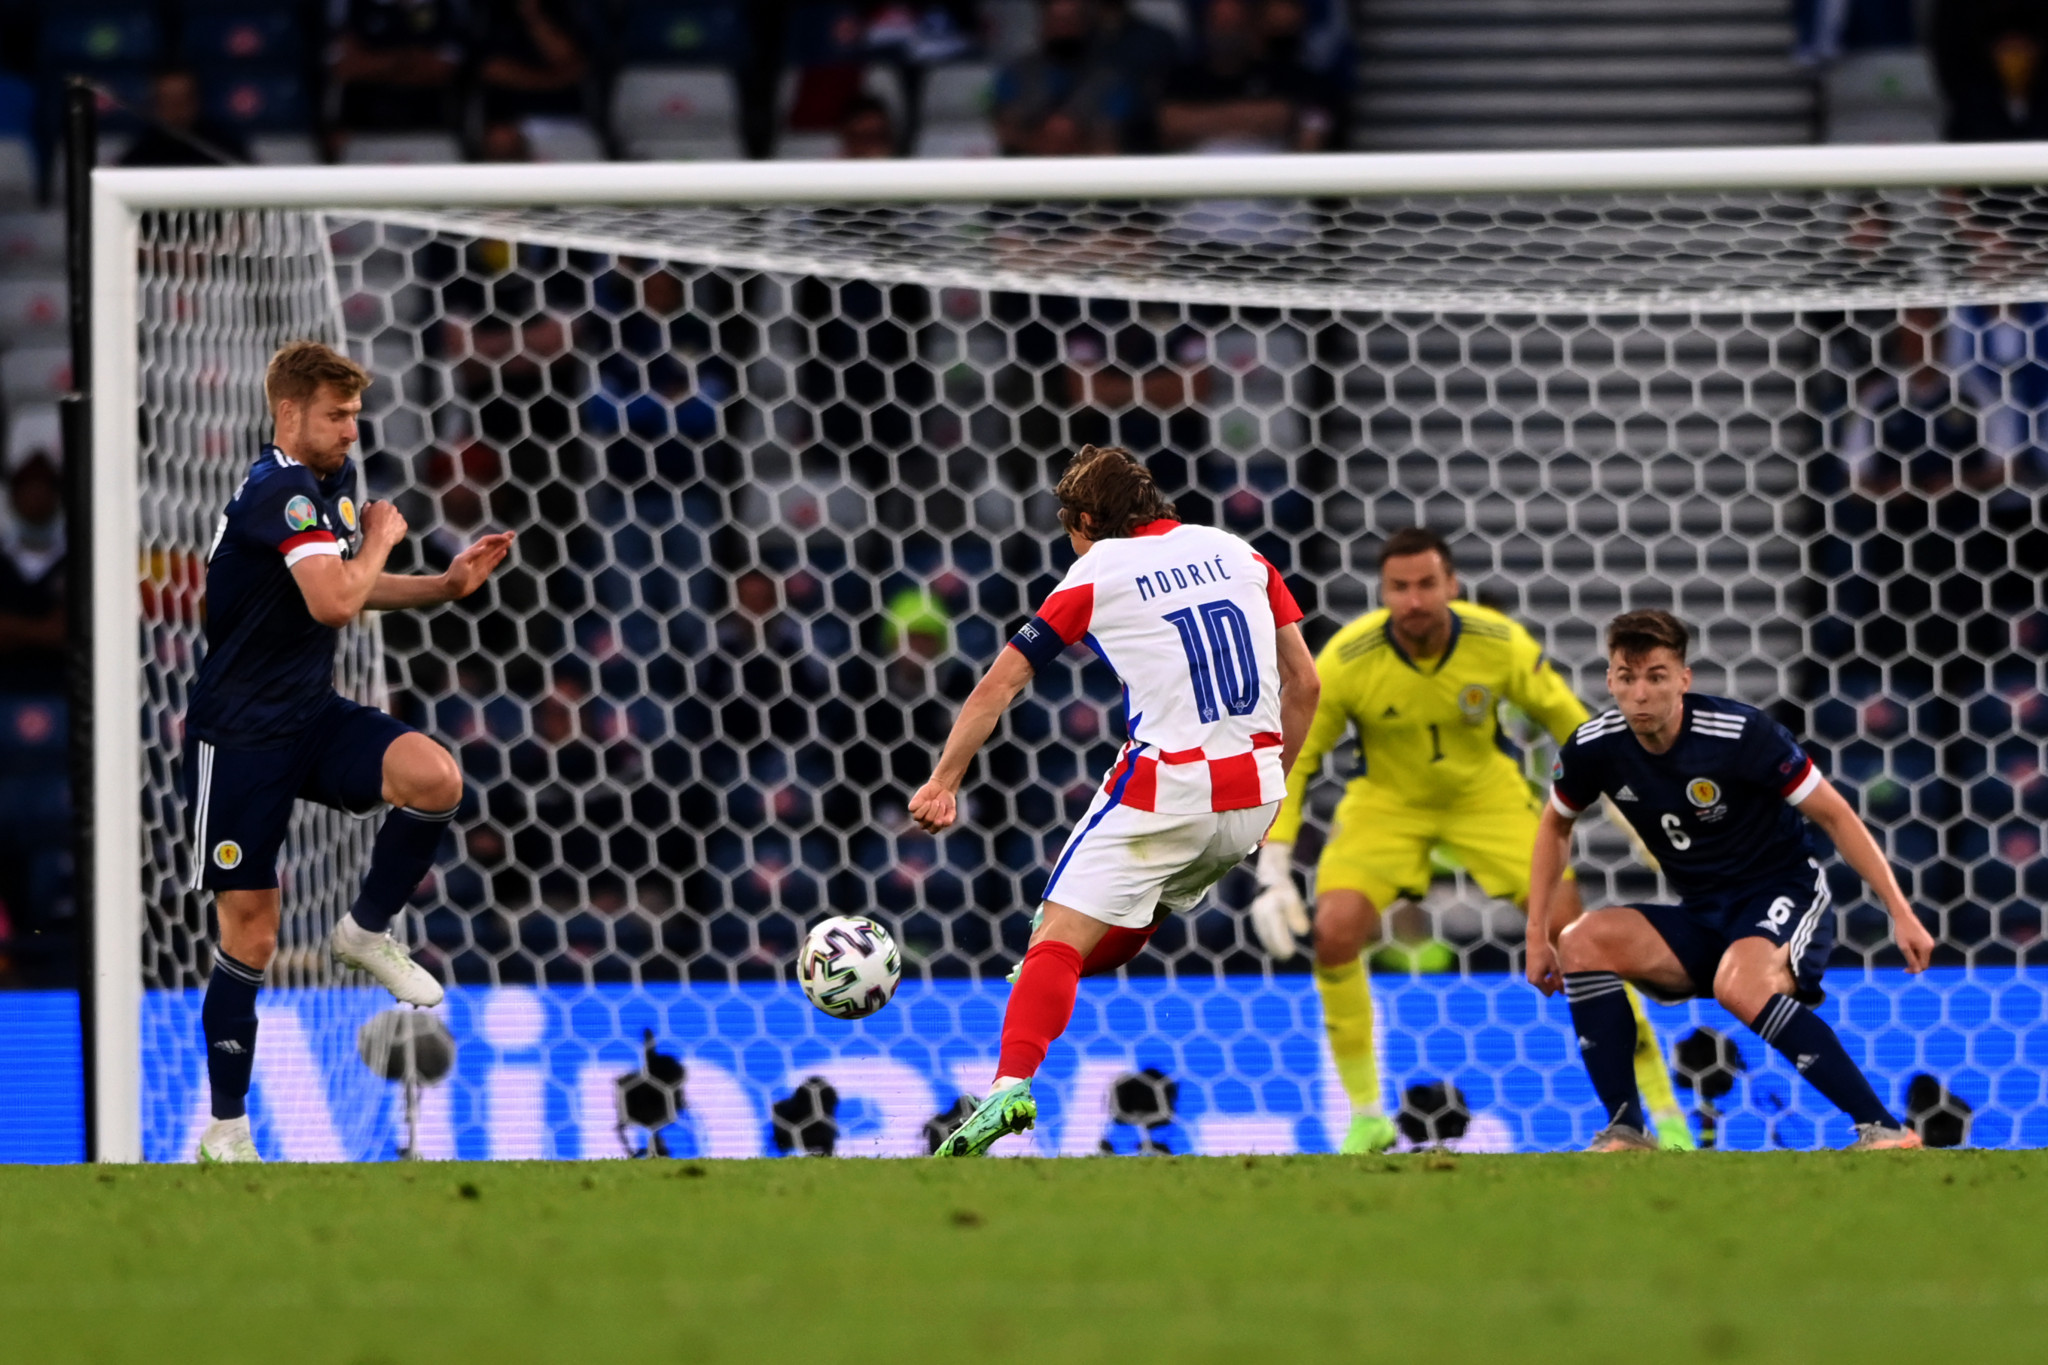 Croatia reach UEFA Euro 2020 last 16 after beating Scotland in crunch game